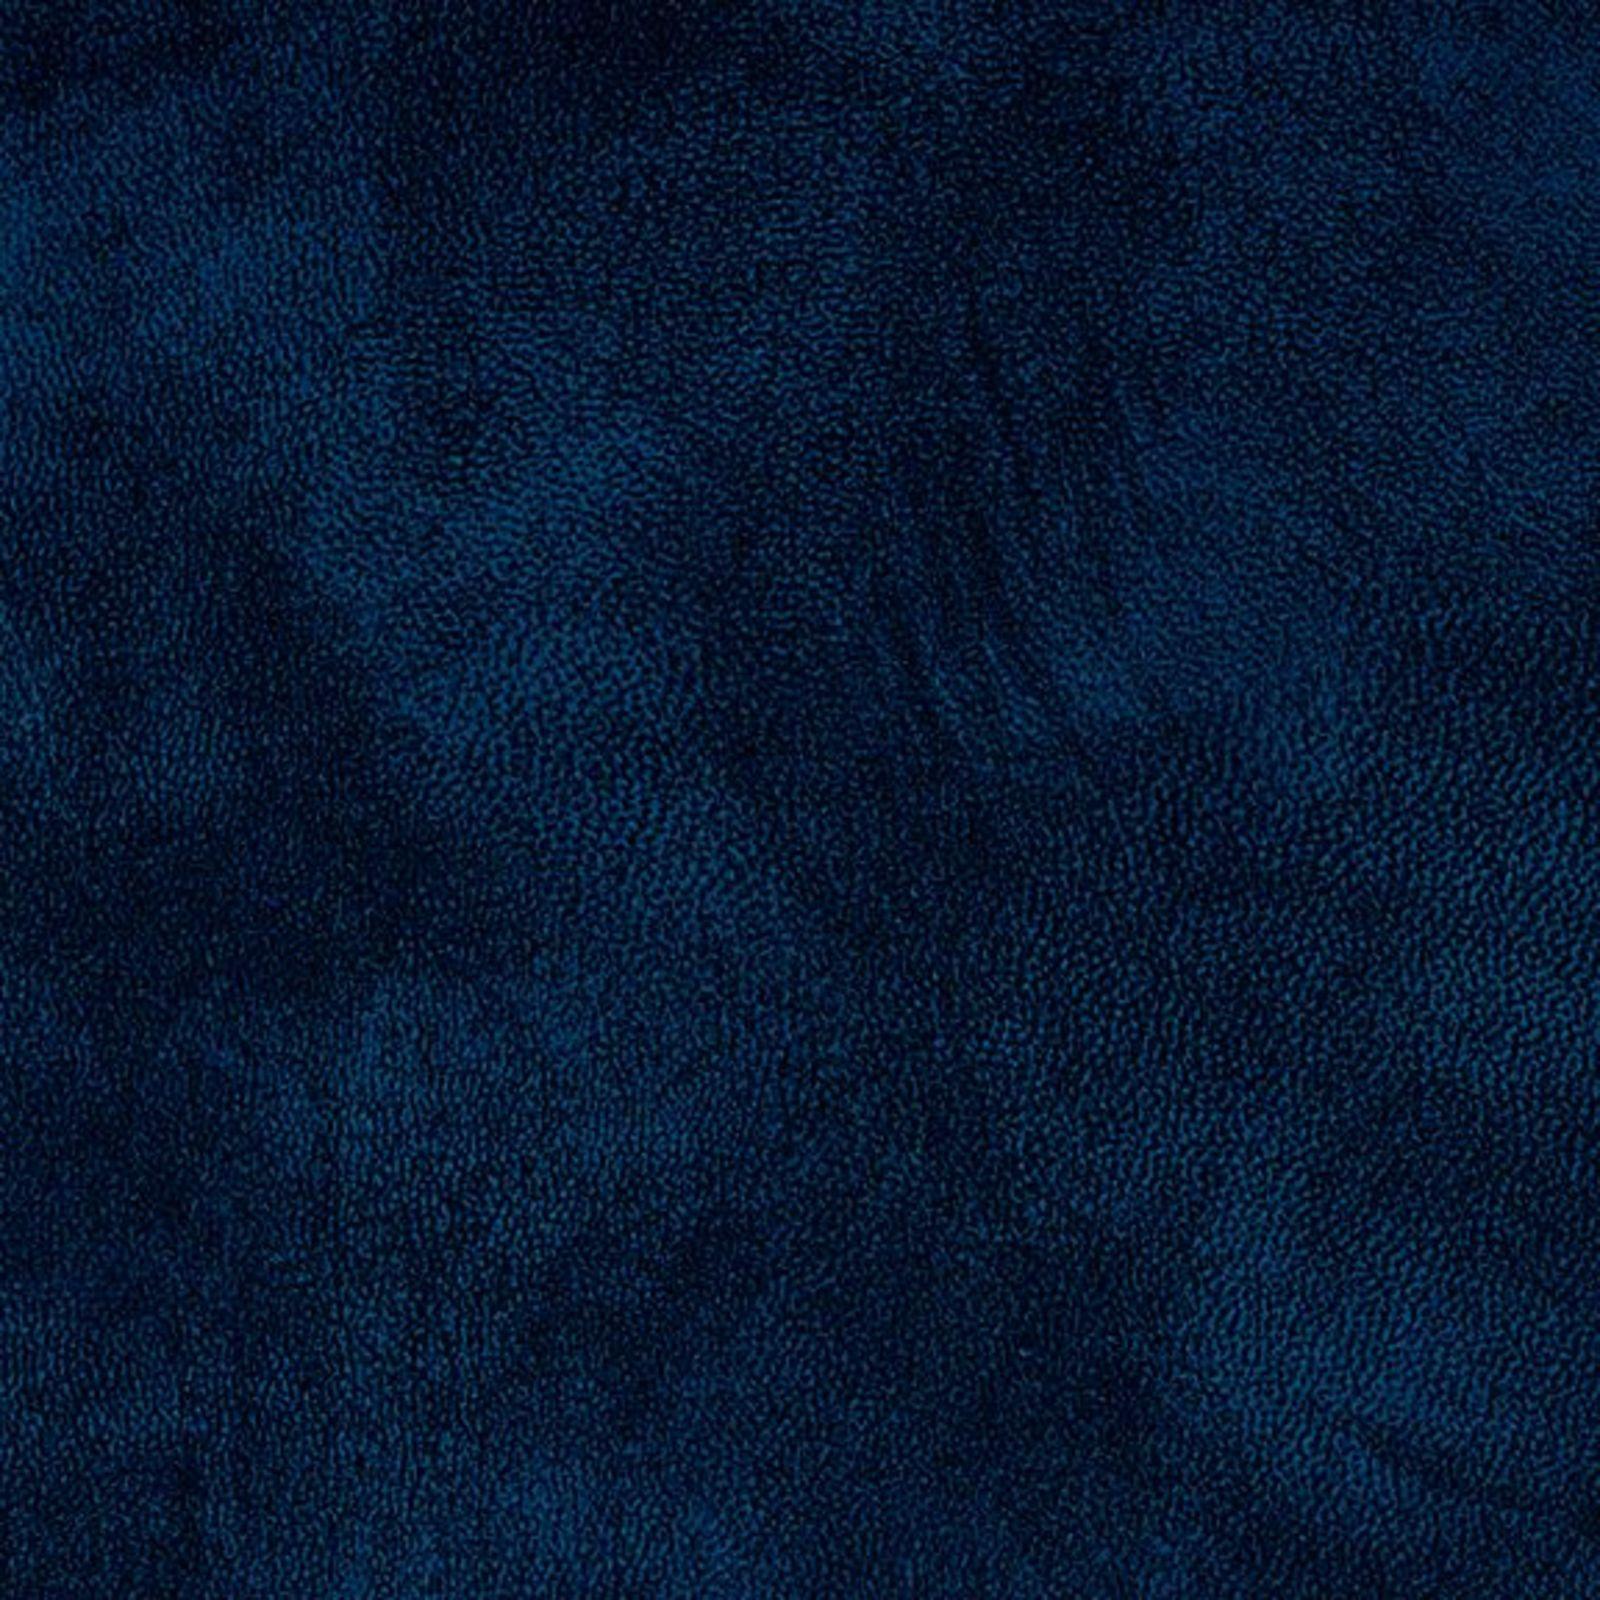 71928 Yorktown Indigo Blue fabric texture, Vinyl fabric